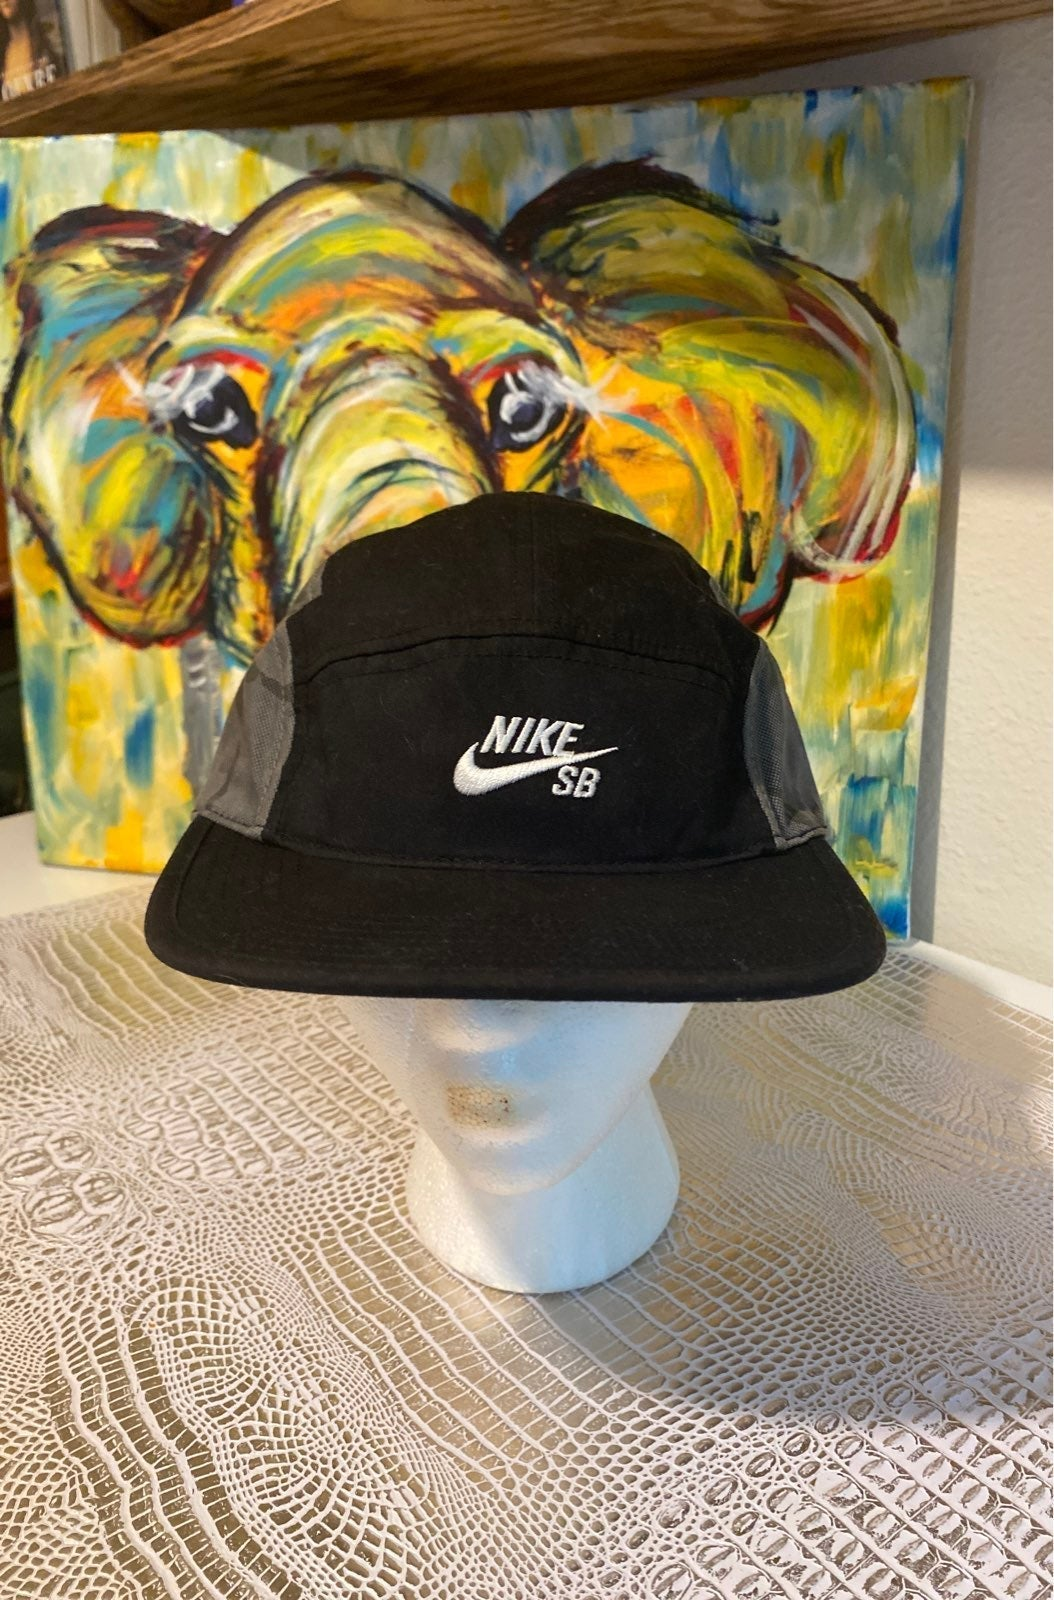 NikeSB Hat